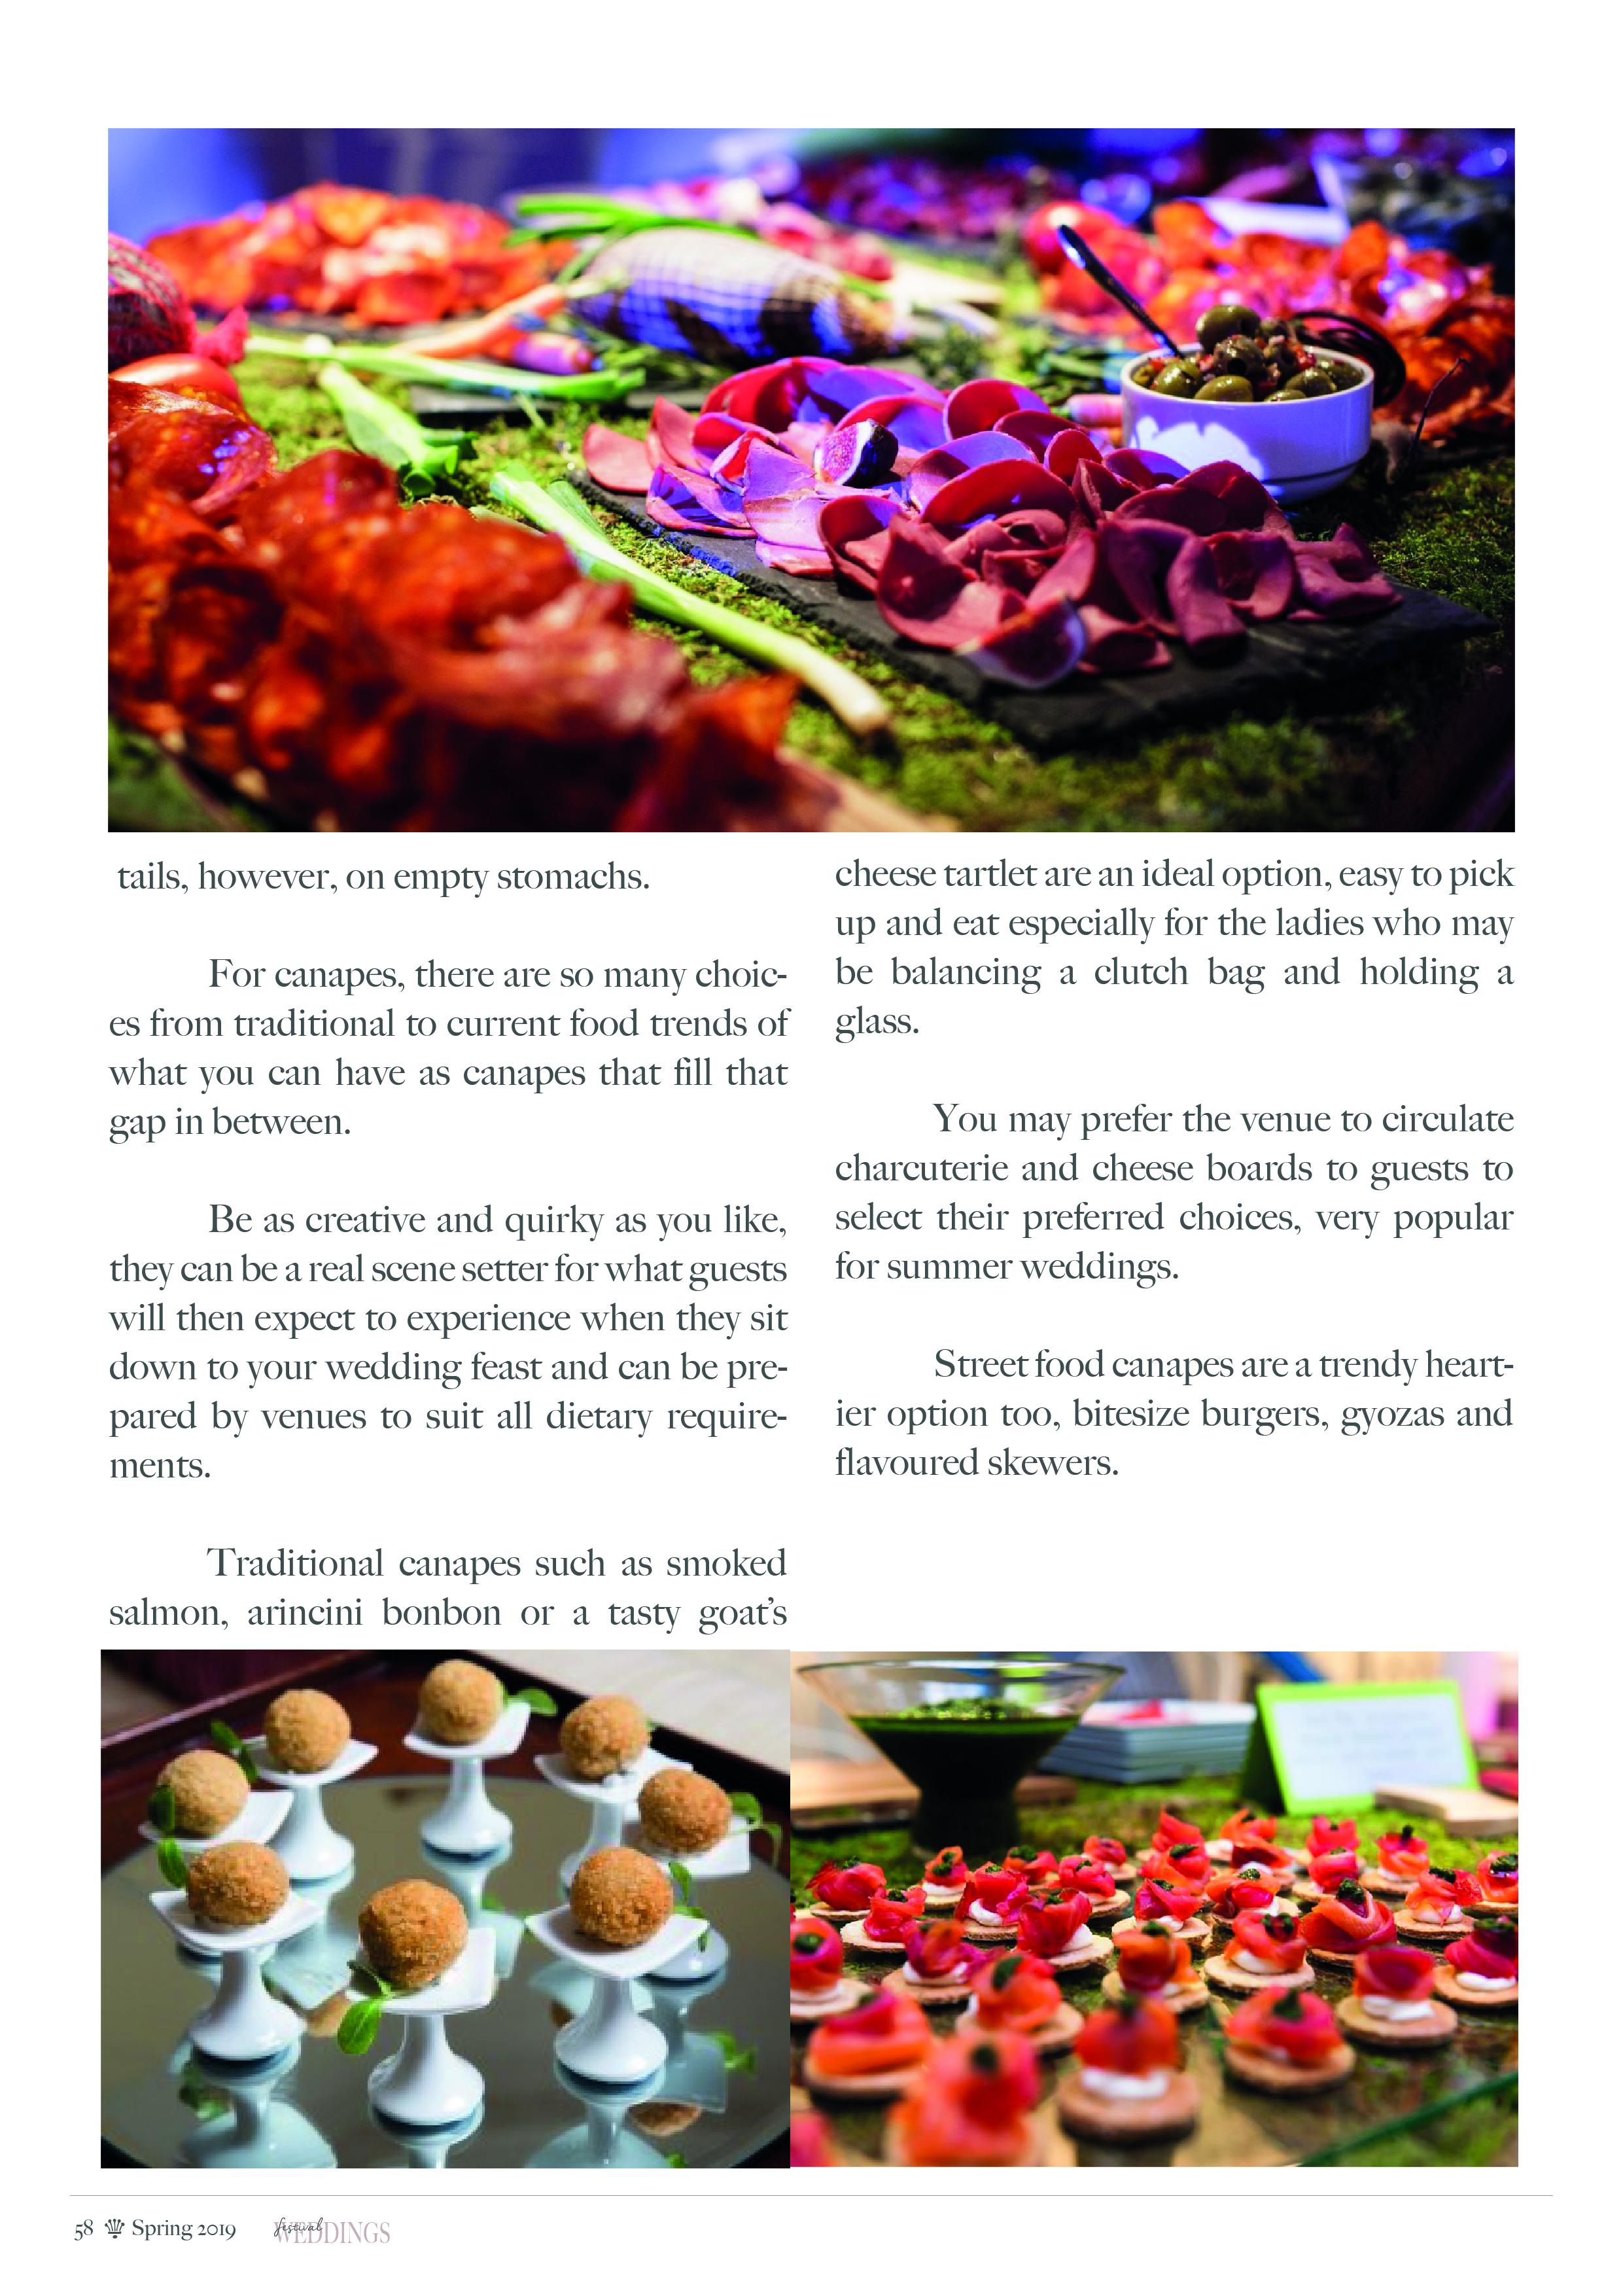 Summer 2019 - Fine Dining & Cuisine-13.jpg